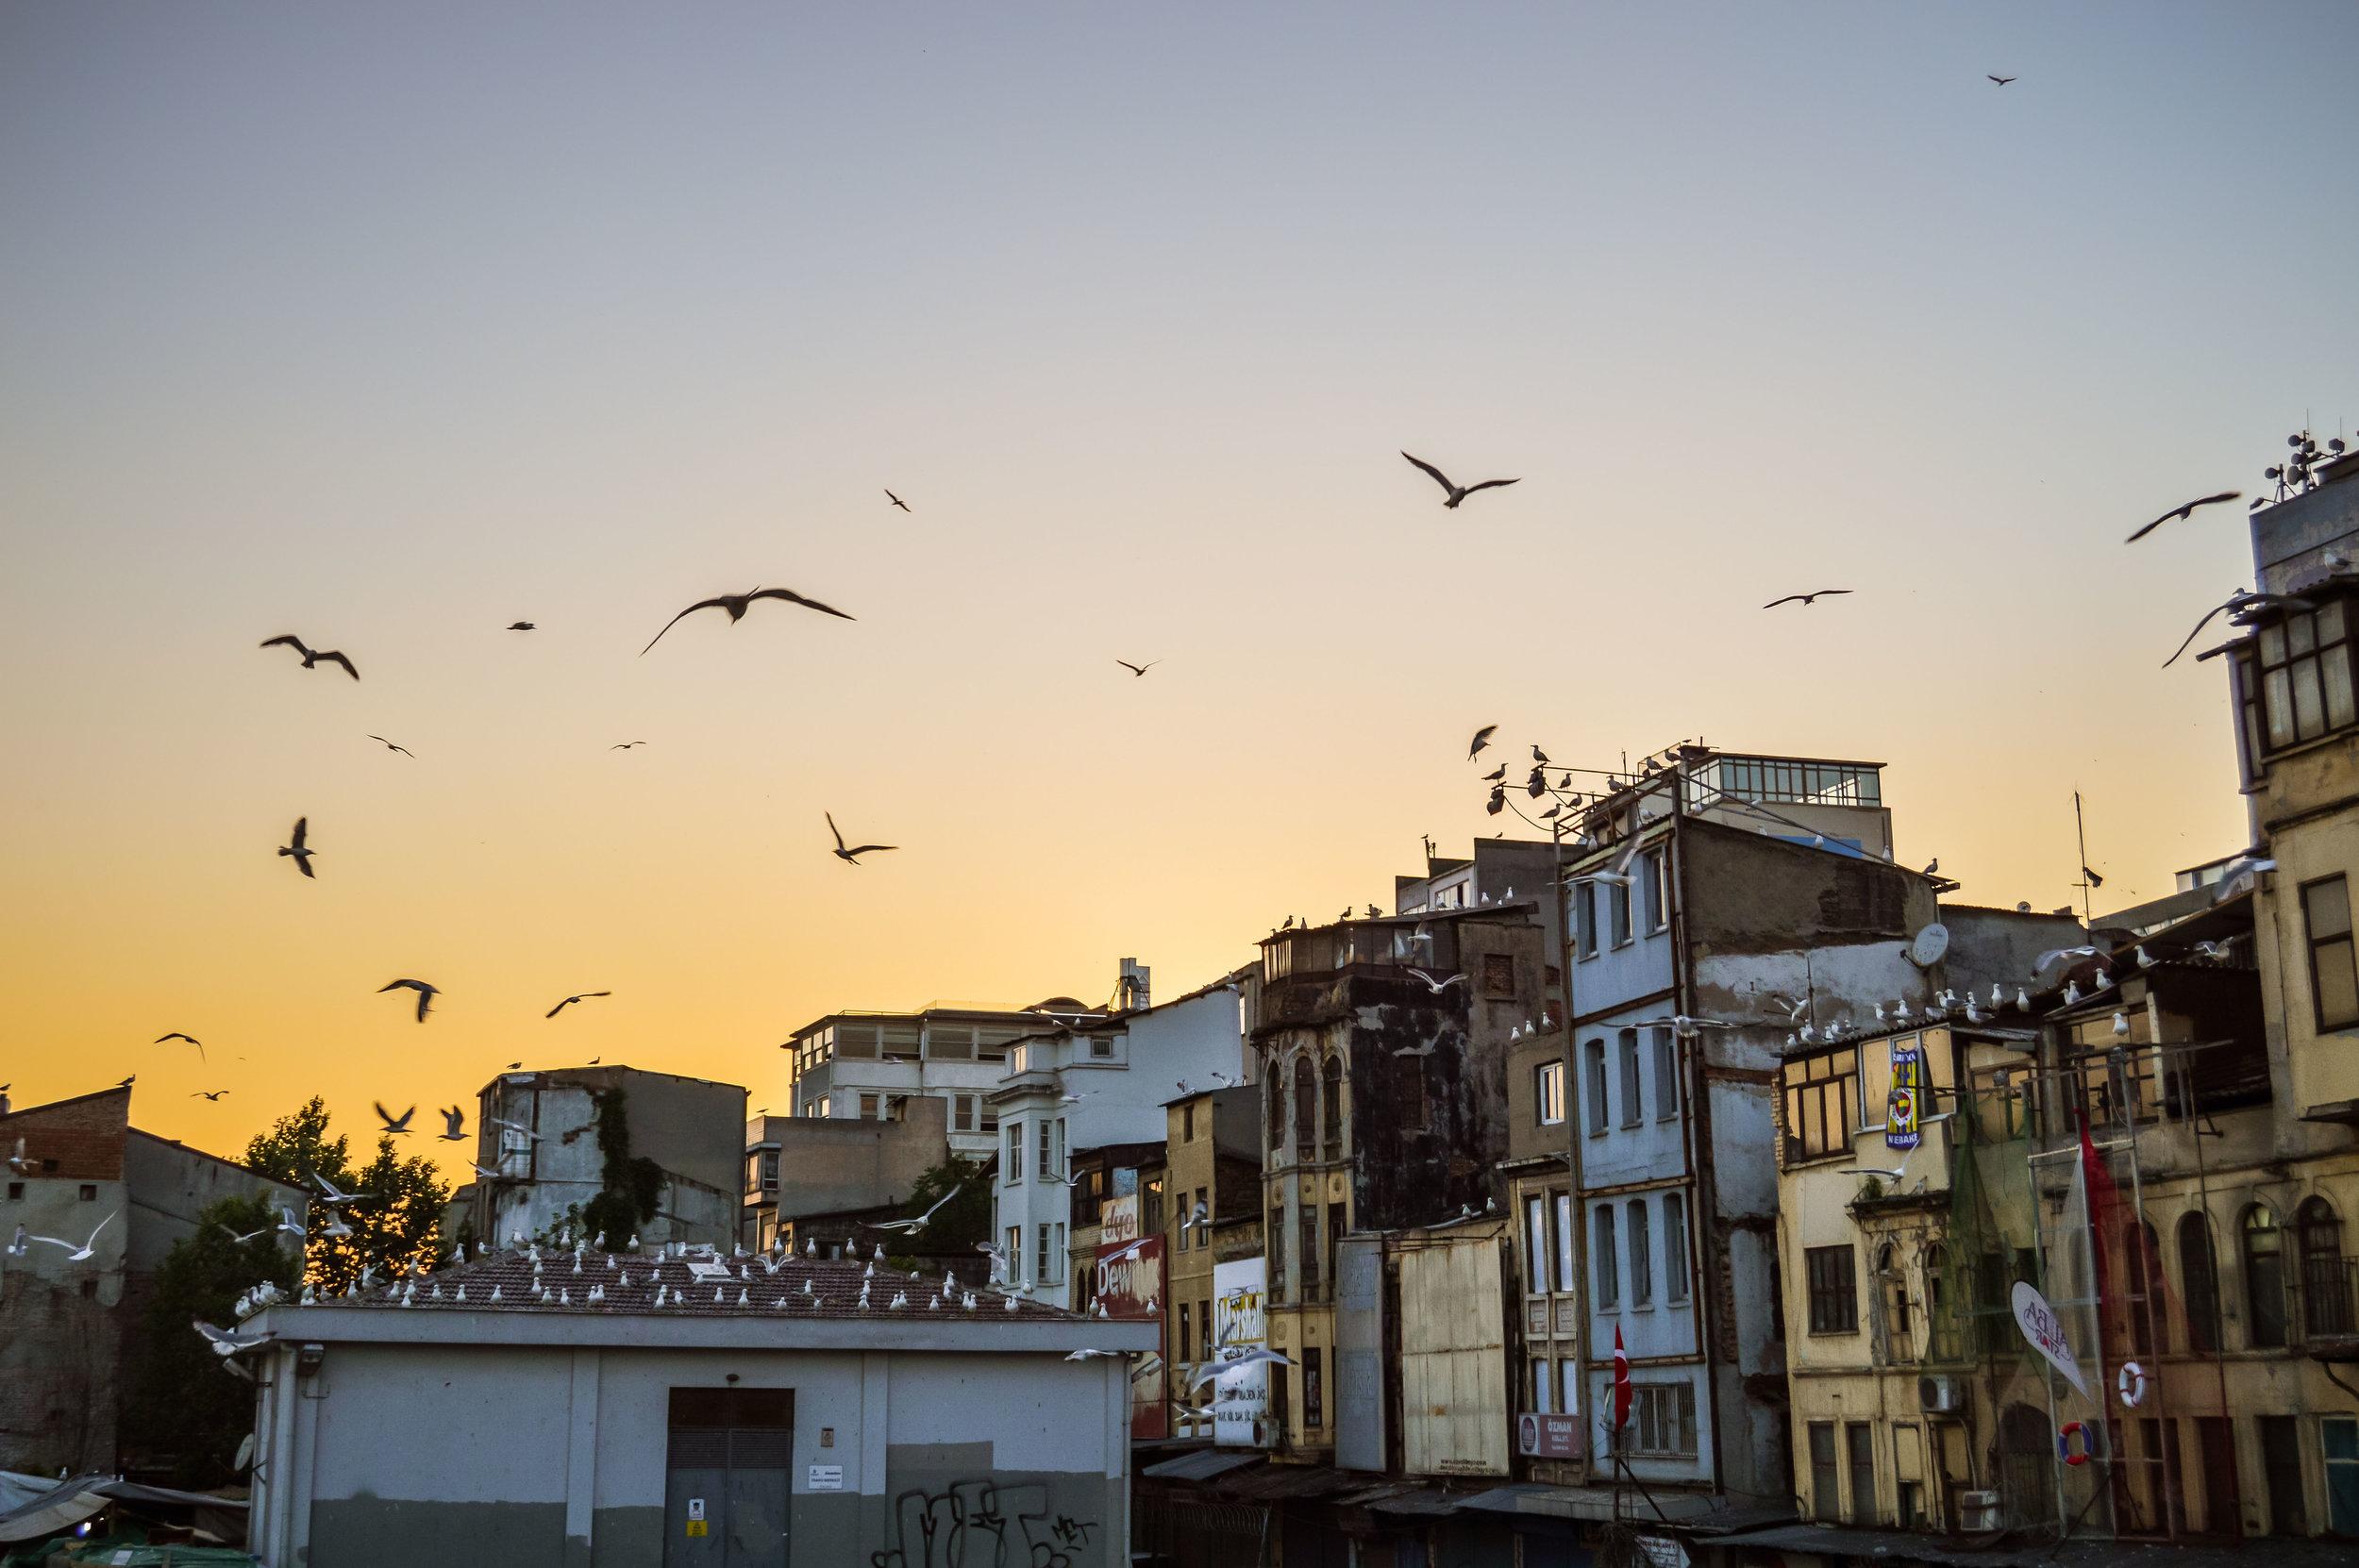 Seagulls Rowhomes Skyline Sunset Blue Sky Muslim Ottoman Empire Architecture Istanbul Turkey